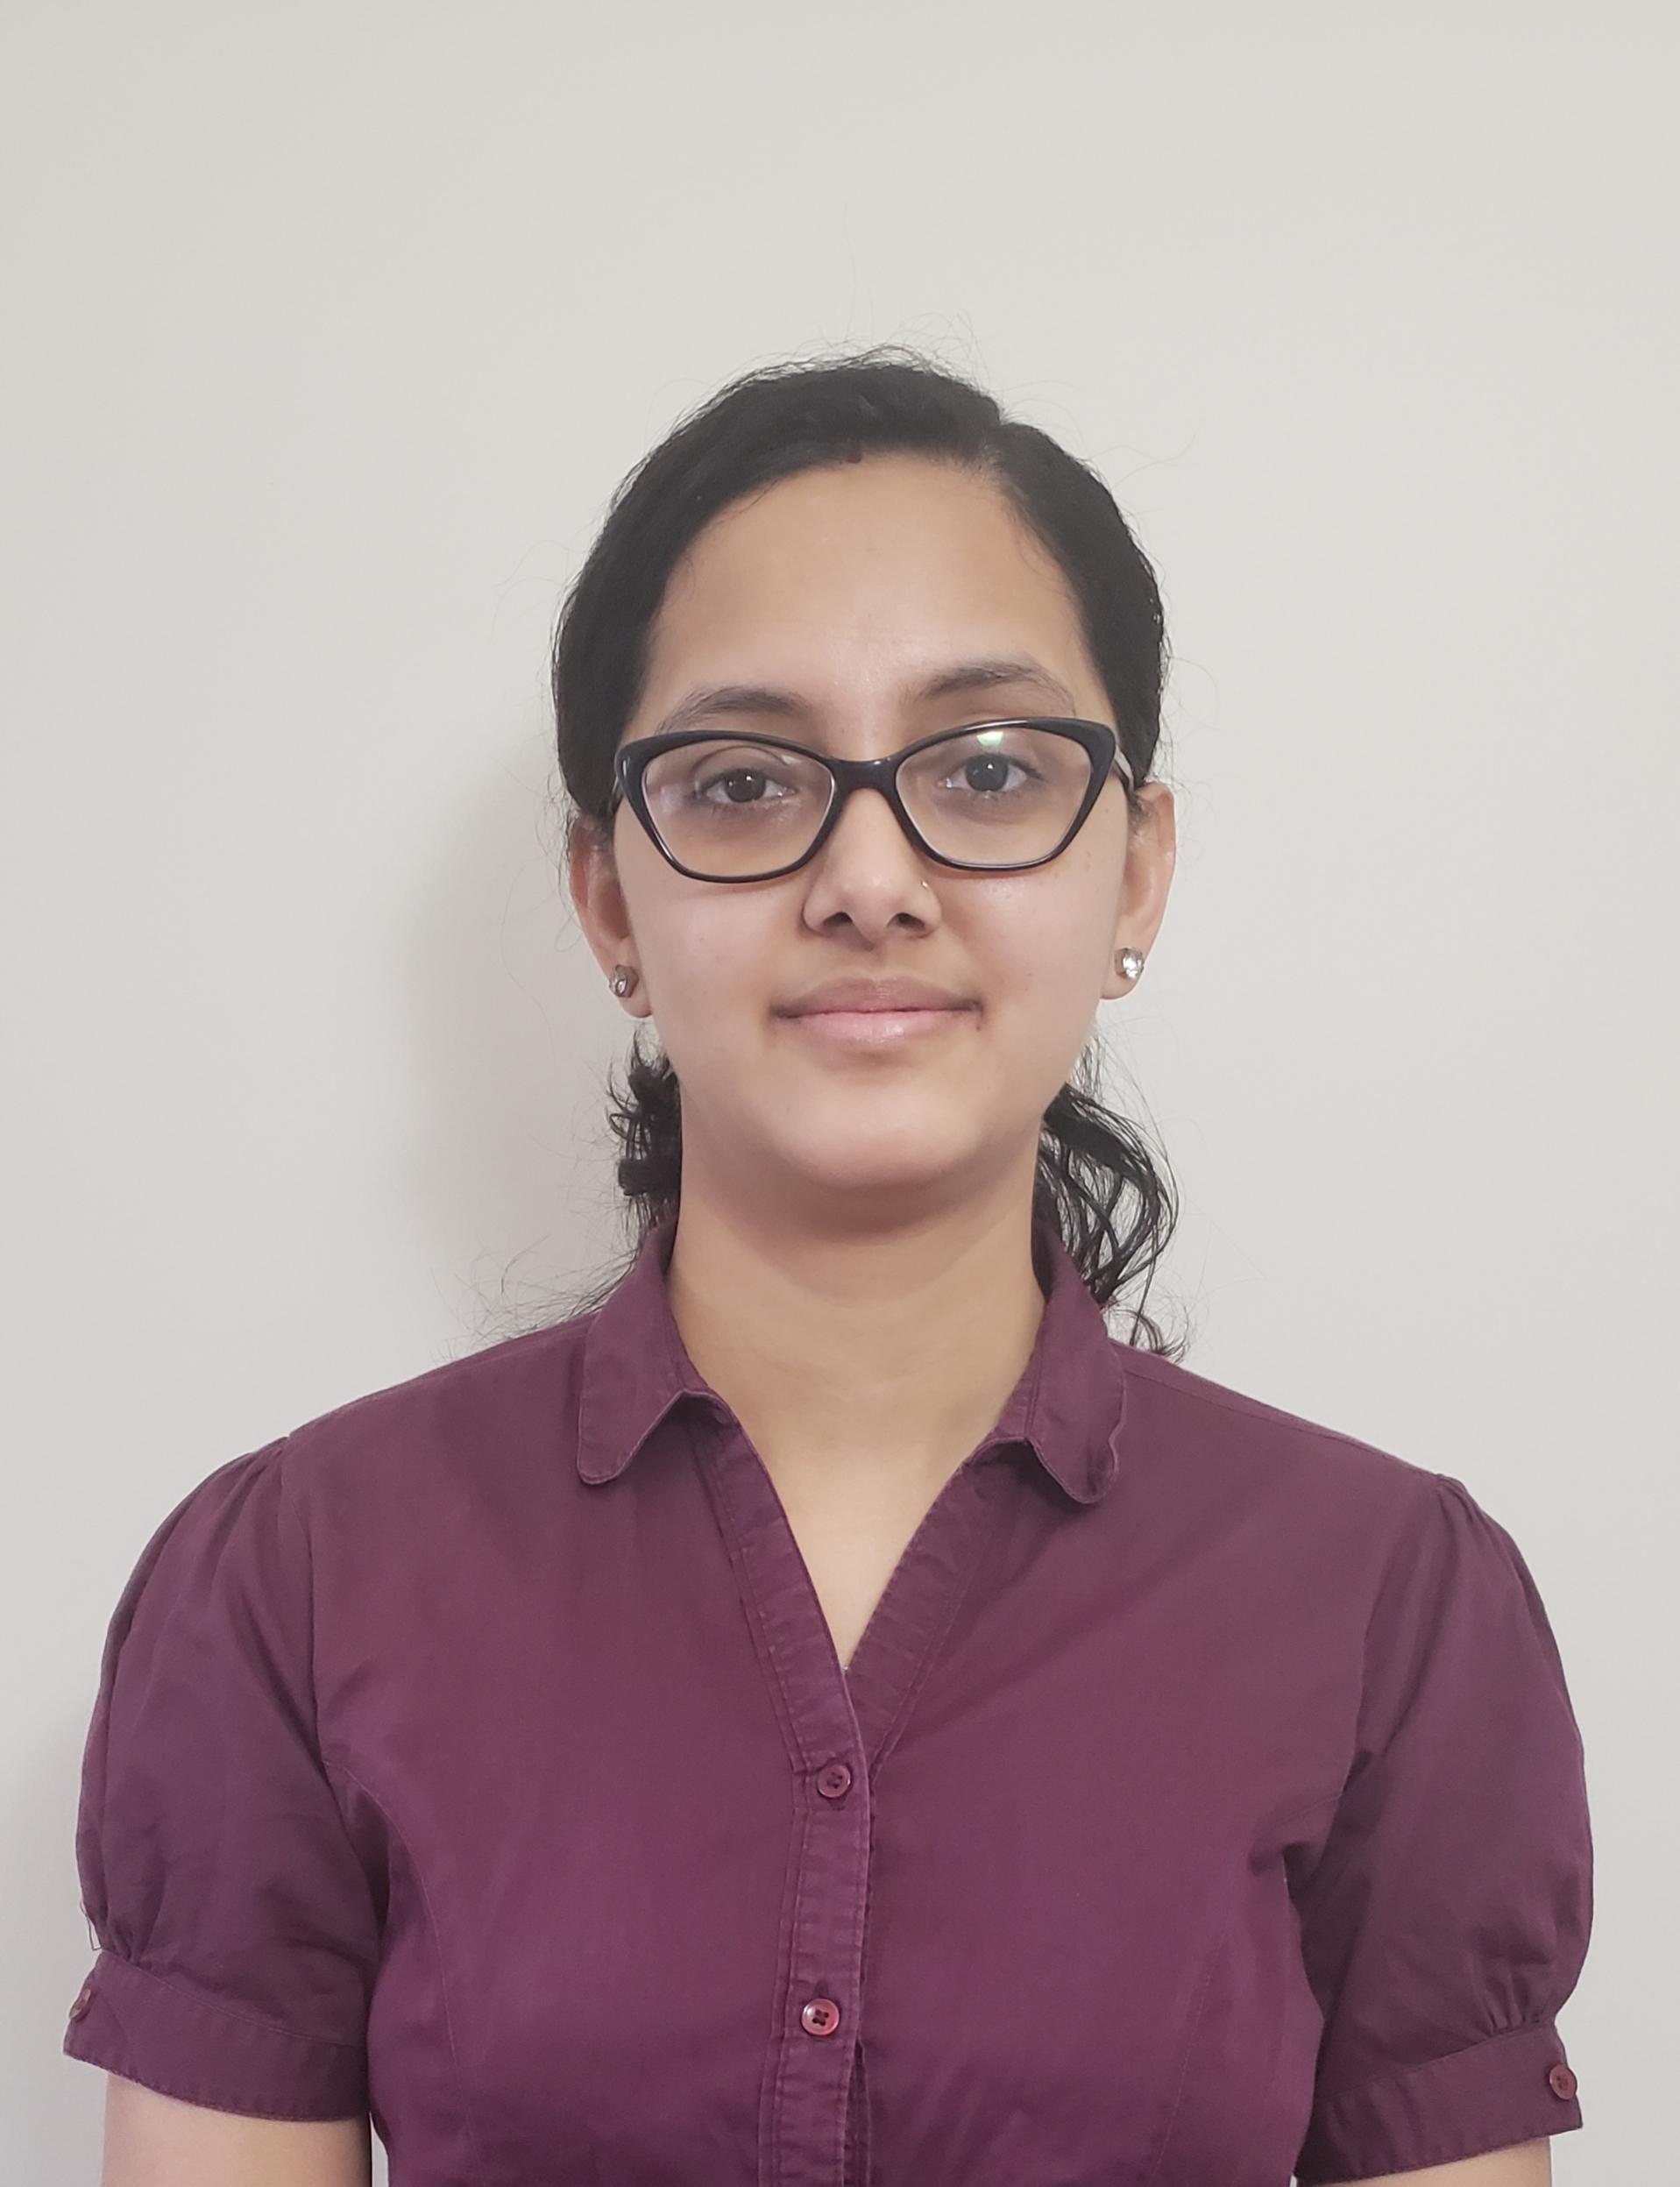 Priyanka pic